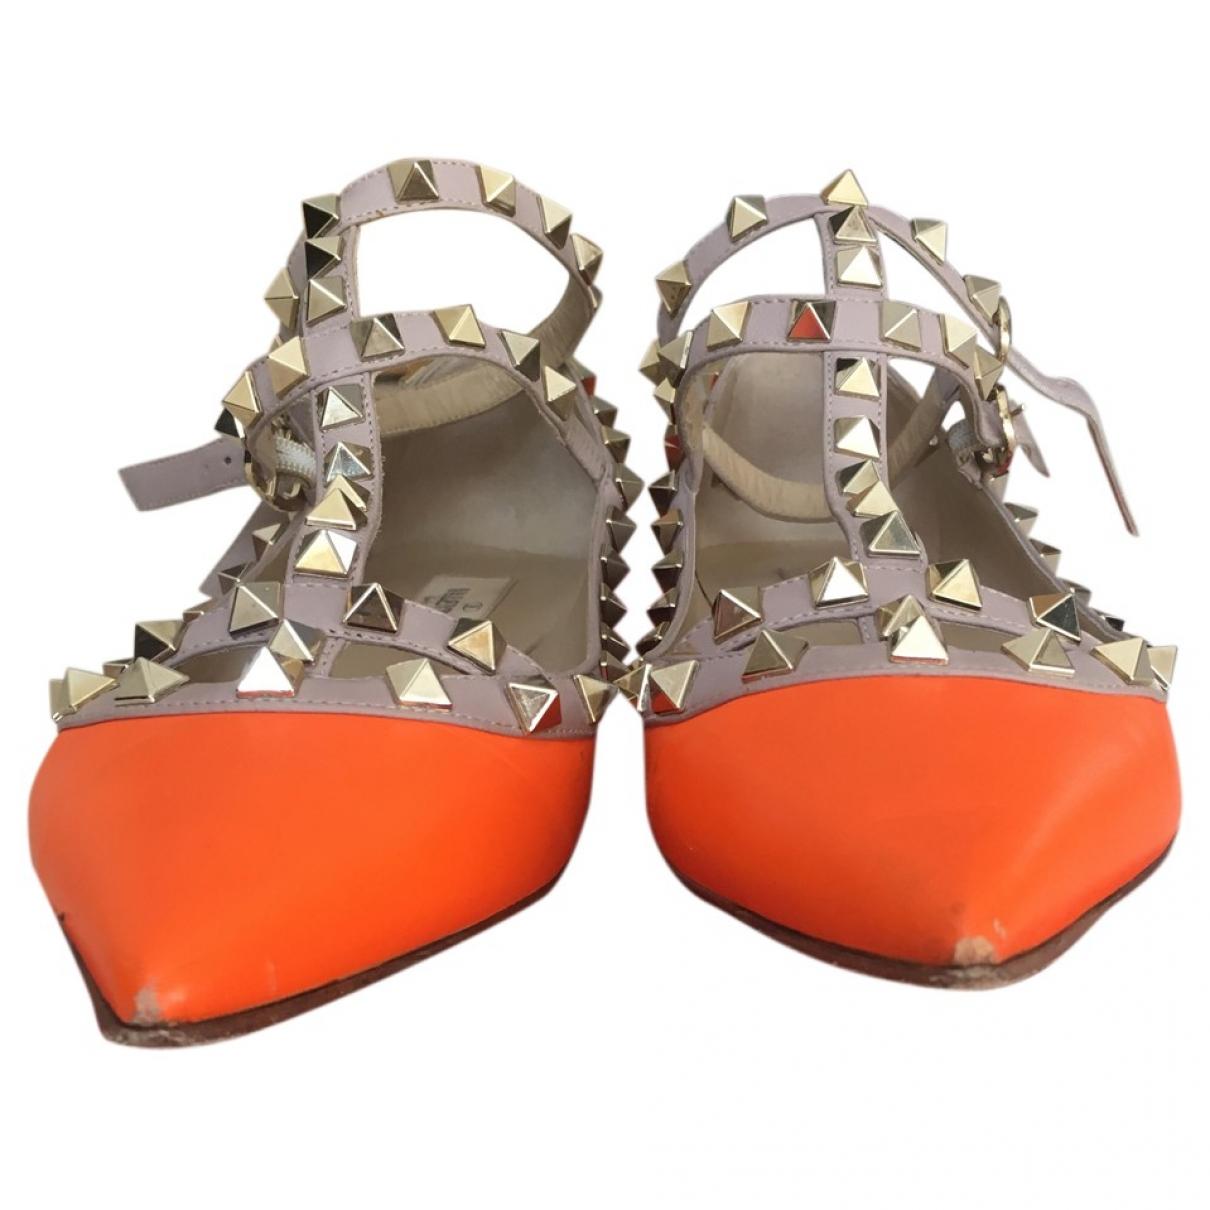 Valentino Garavani Rockstud Orange Leather Ballet flats for Women 37.5 EU